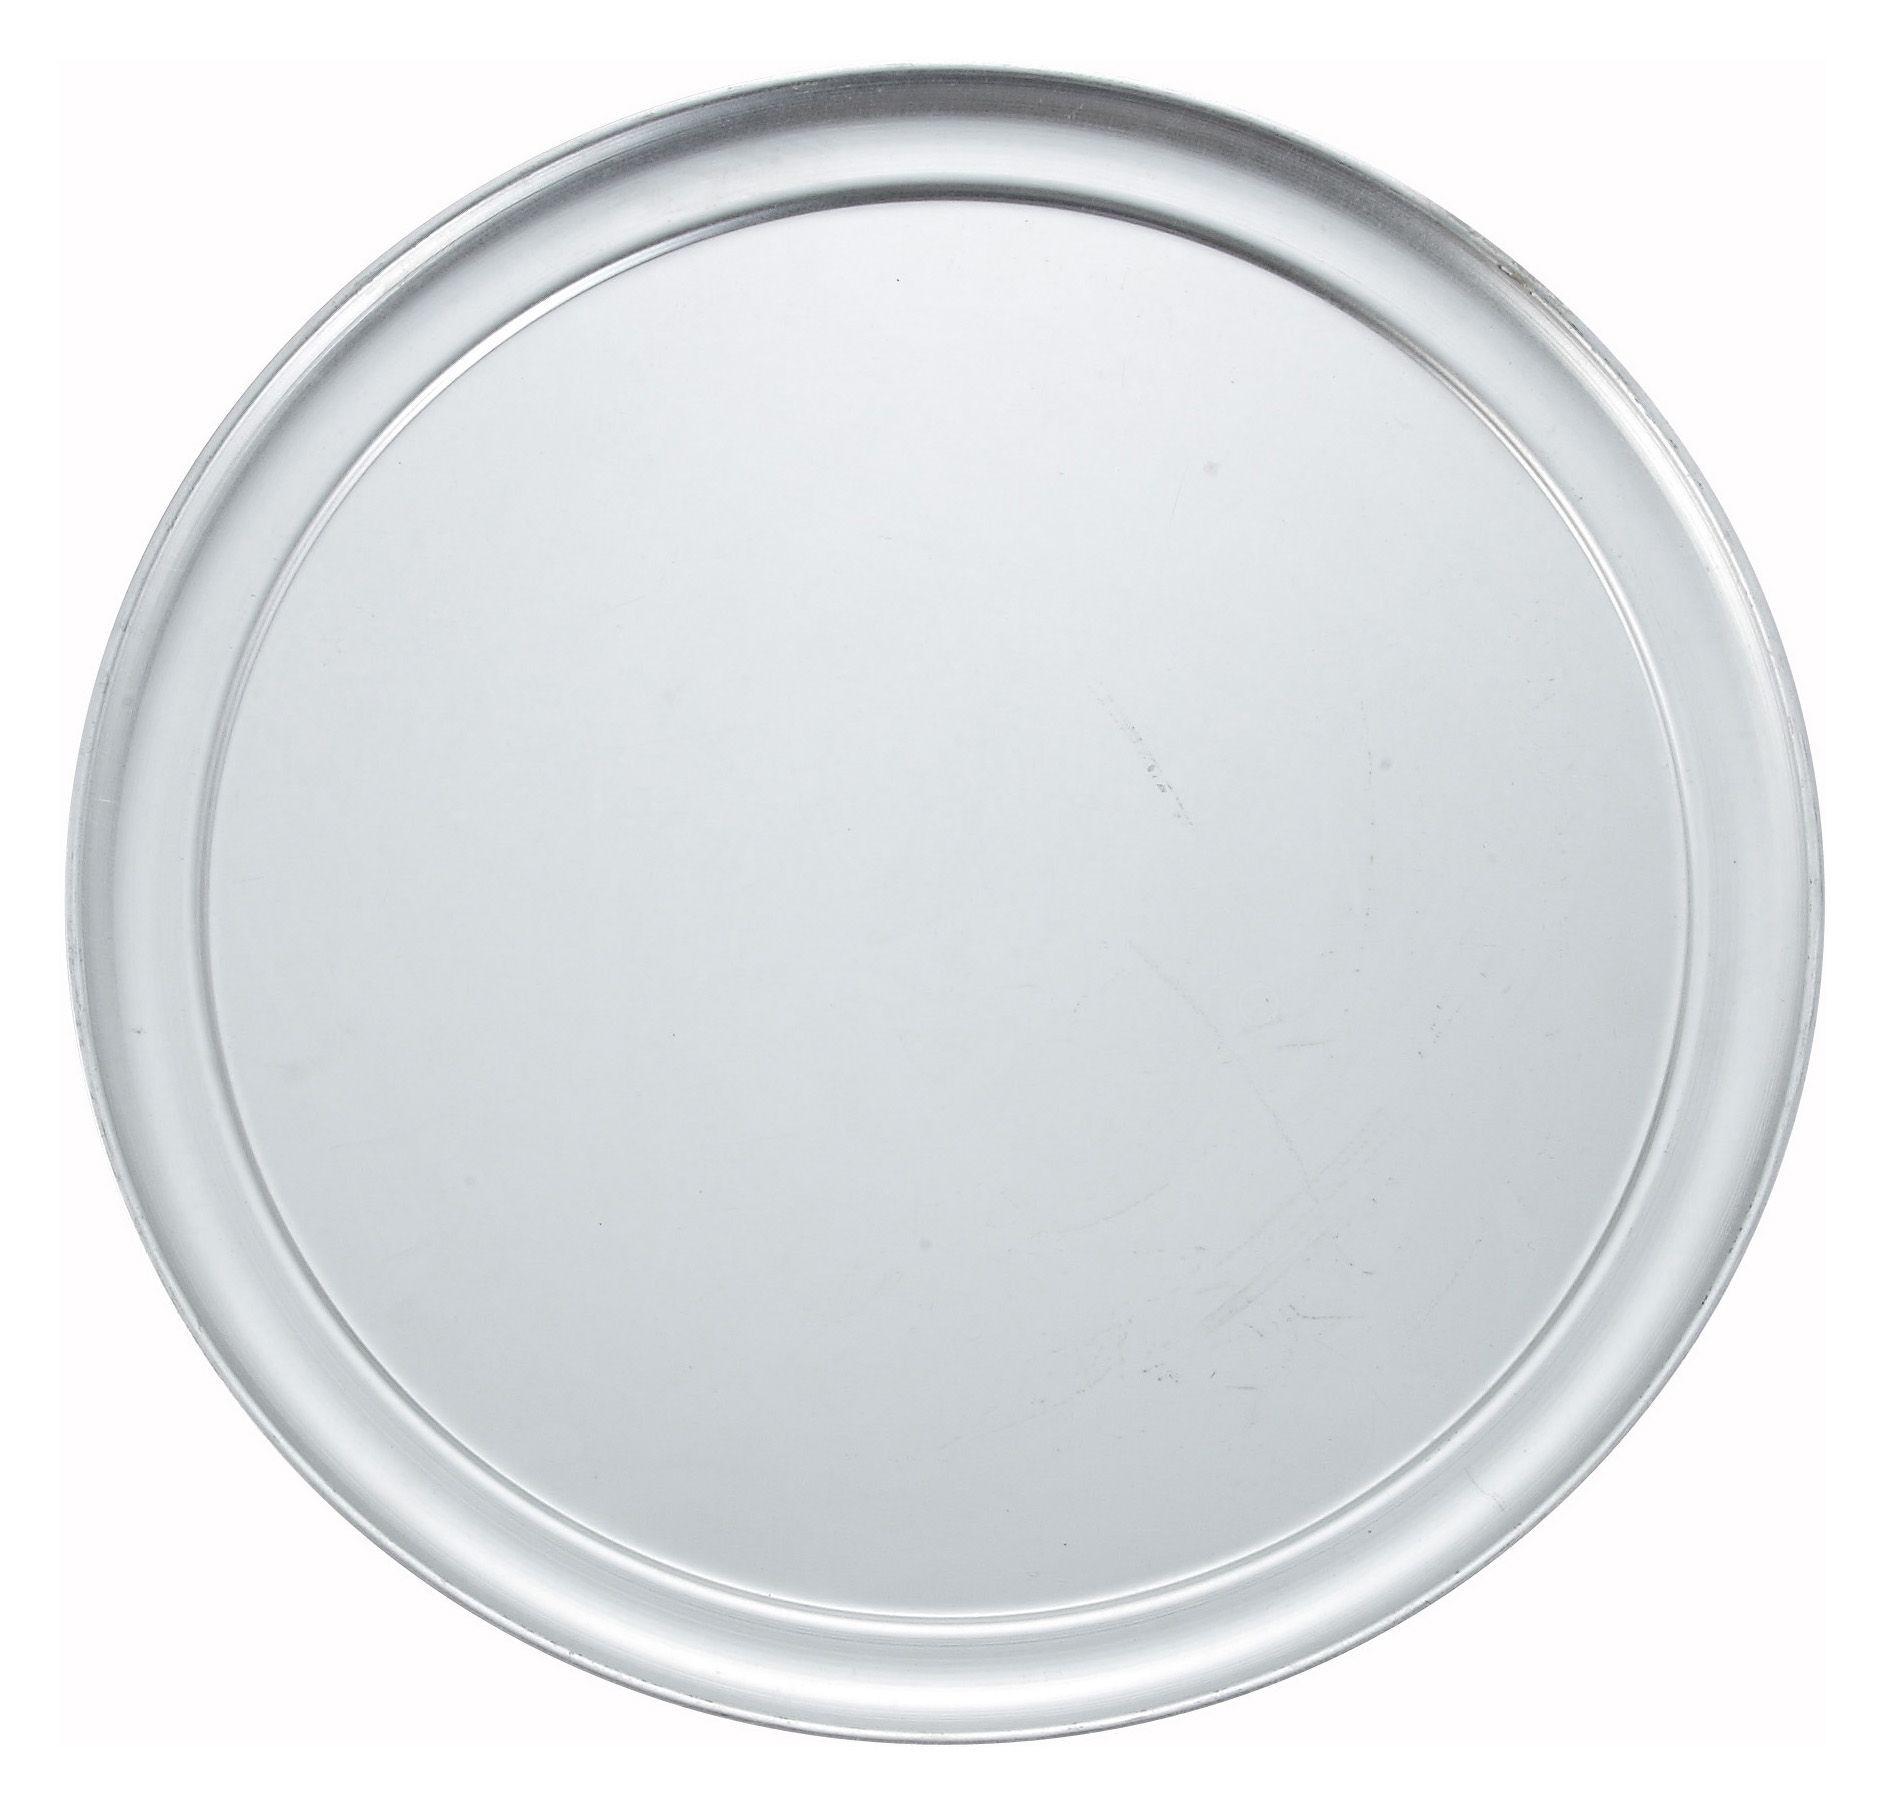 "Winco APZT-15 Wide-Rimmed Aluminum Pizza Pan 15"" Dia."